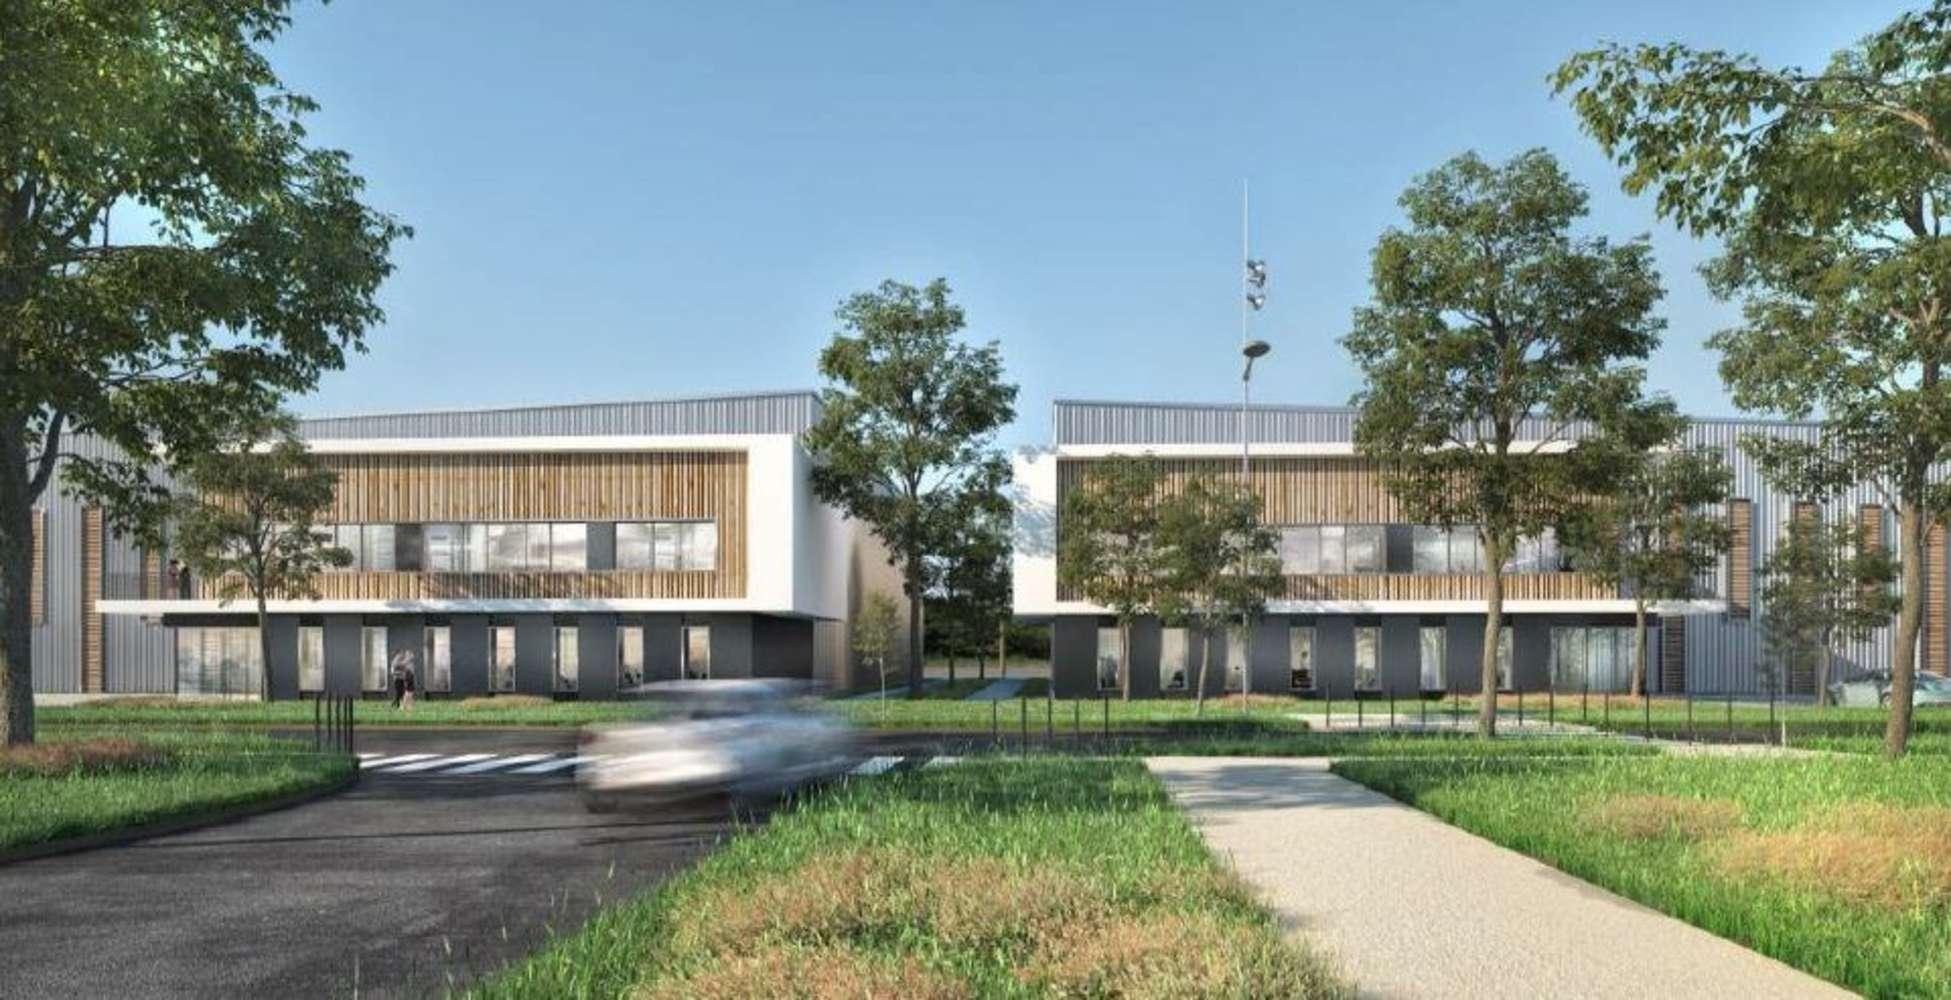 Activités/entrepôt Groslay, 95410 - MONTS DU VAL D'OISE - 9845752